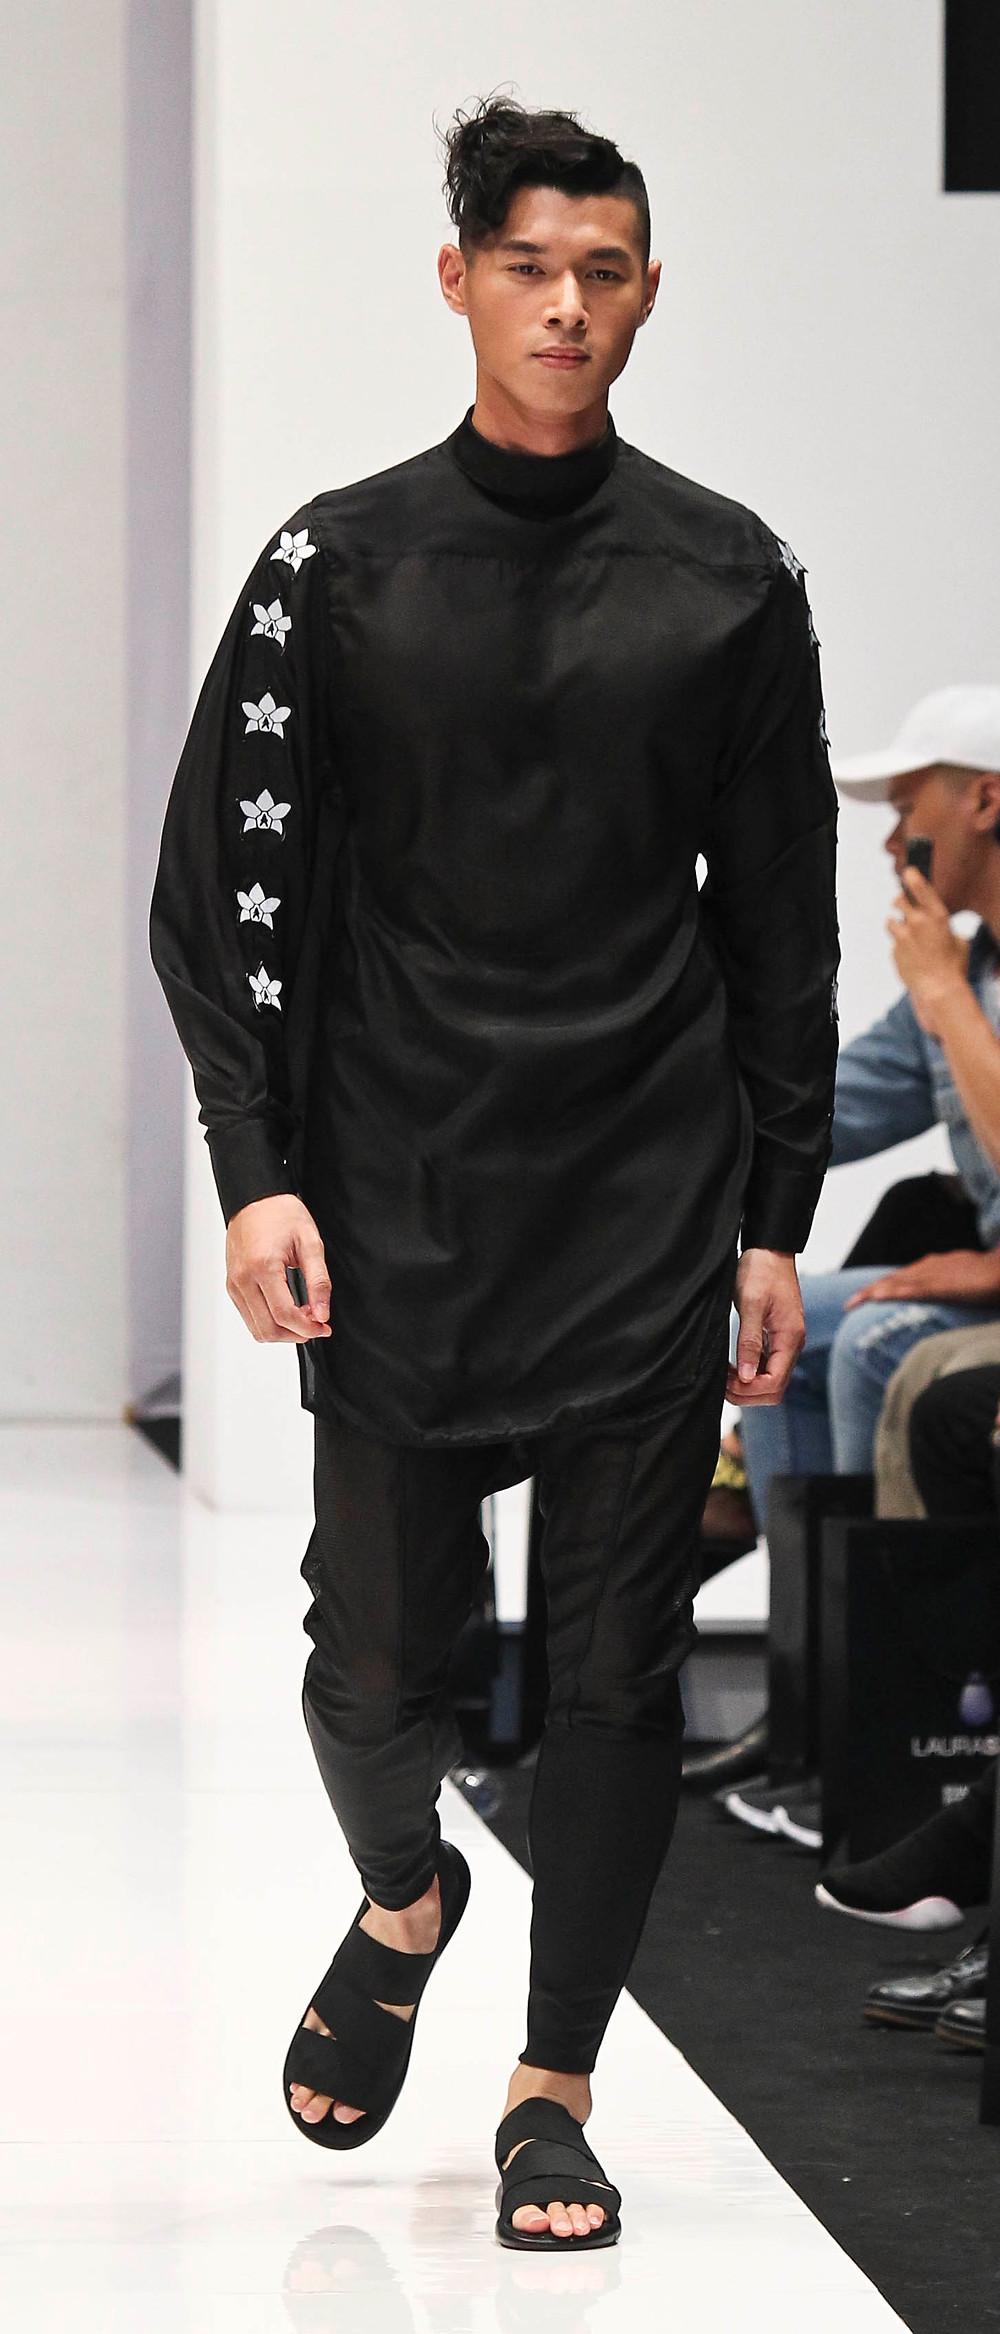 Wolfgang at KLFWRTW2016 : Kuala Lumpur Fashion Week RTW 2016